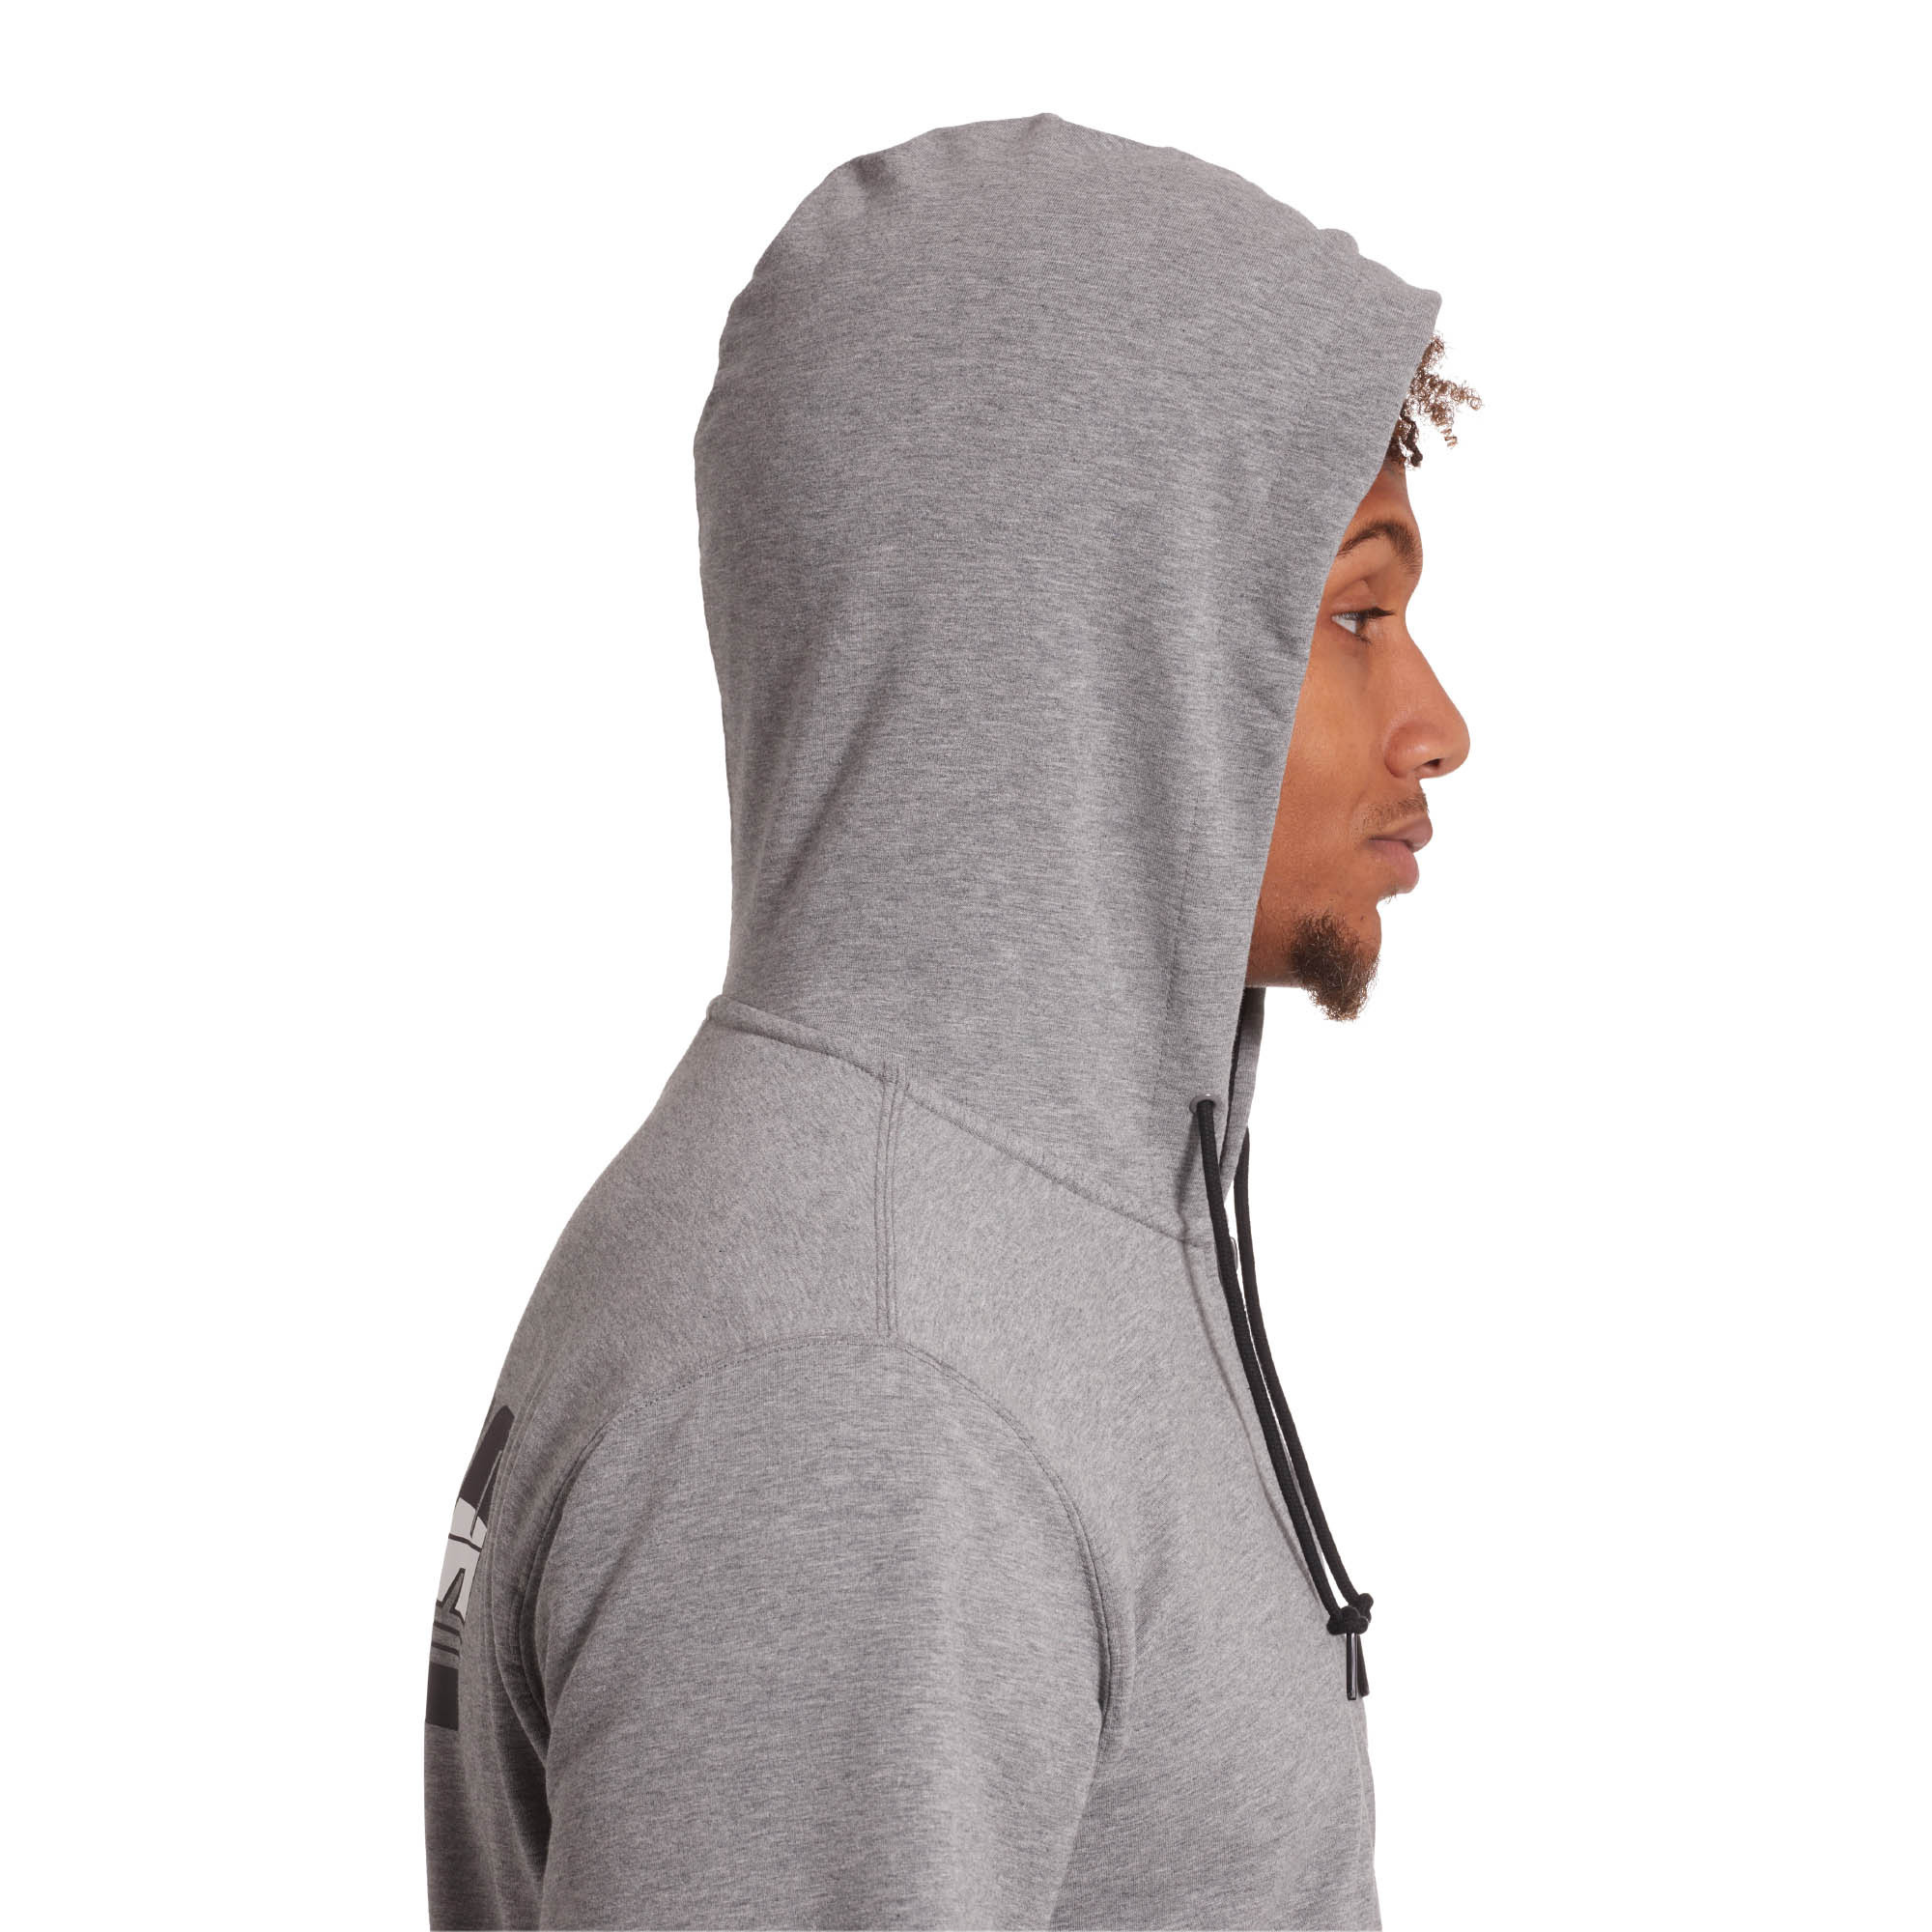 PUMA-Rebel-Men-s-Hooded-Jacket-Men-Sweat-Basics miniatura 10